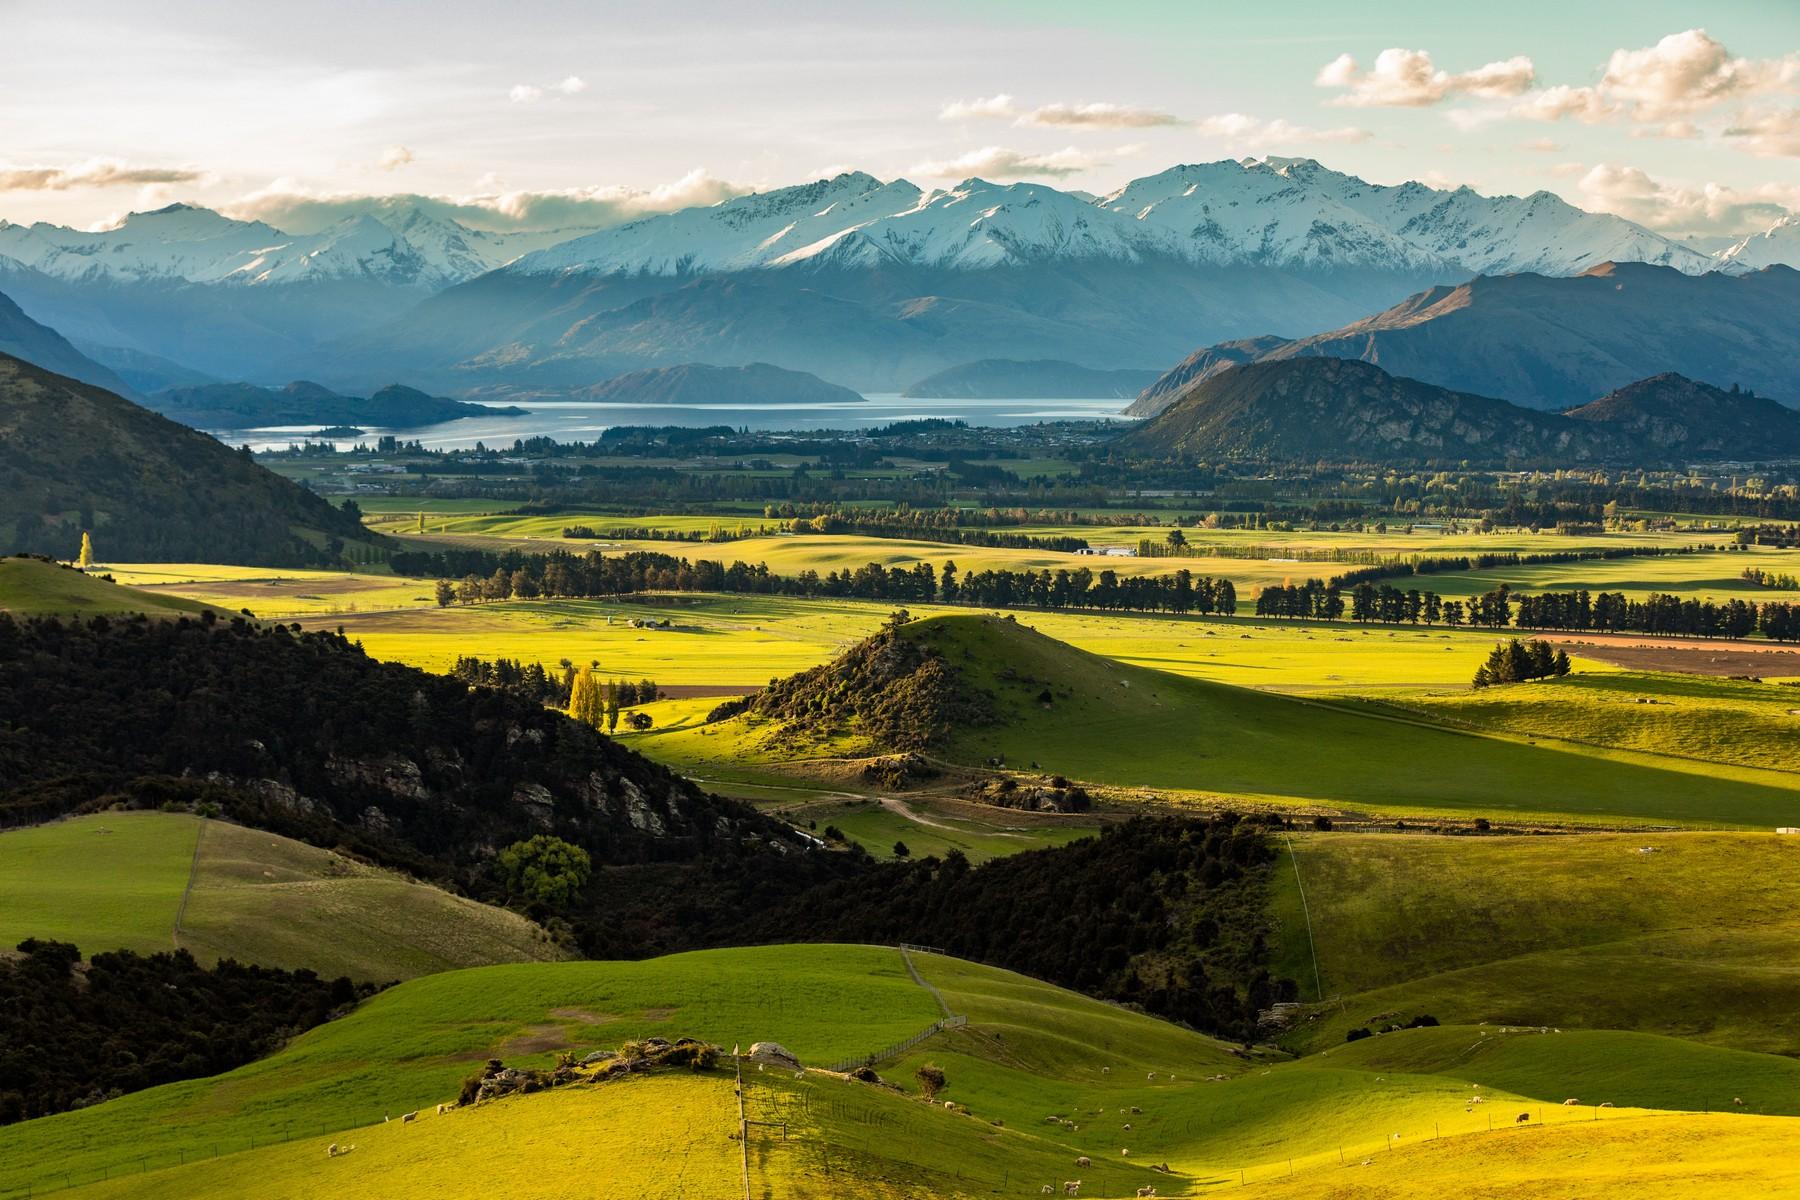 Ферма / ранчо / плантация для того Продажа на Lake McKay Station Wanaka, Отаго, Новая Зеландия